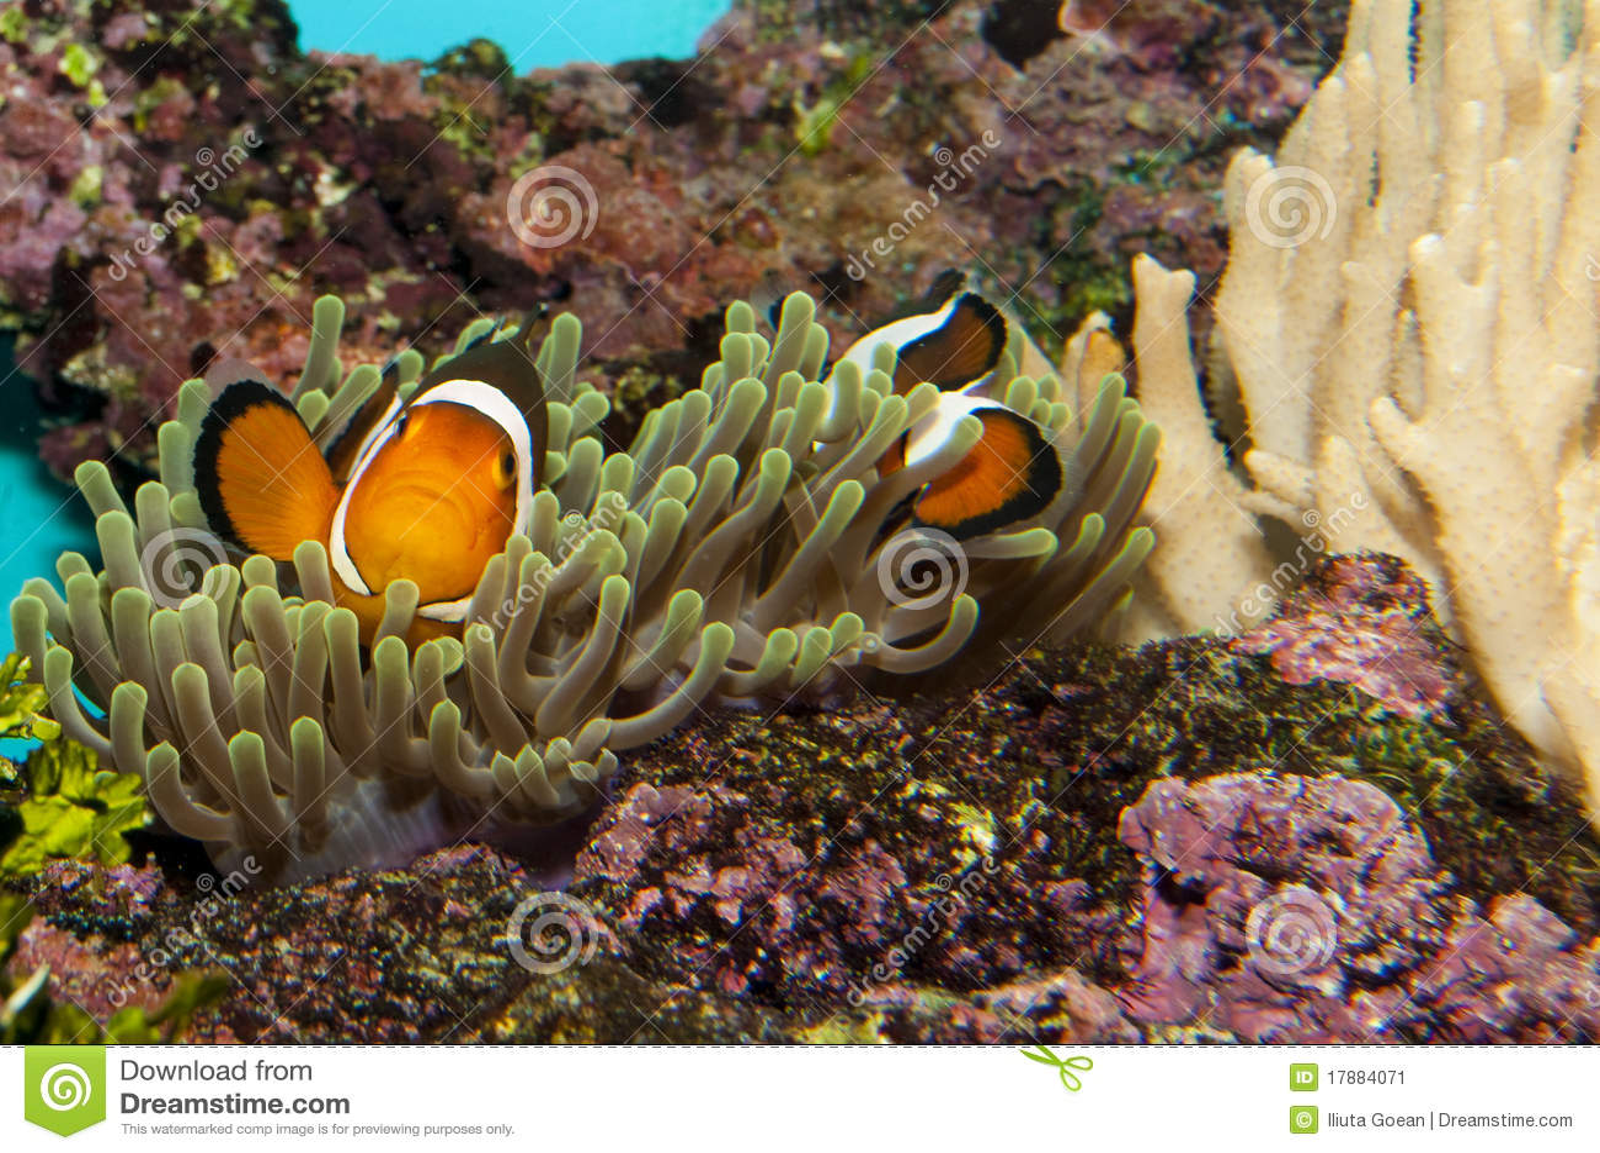 Ocellaris clownfish anemone - photo#16